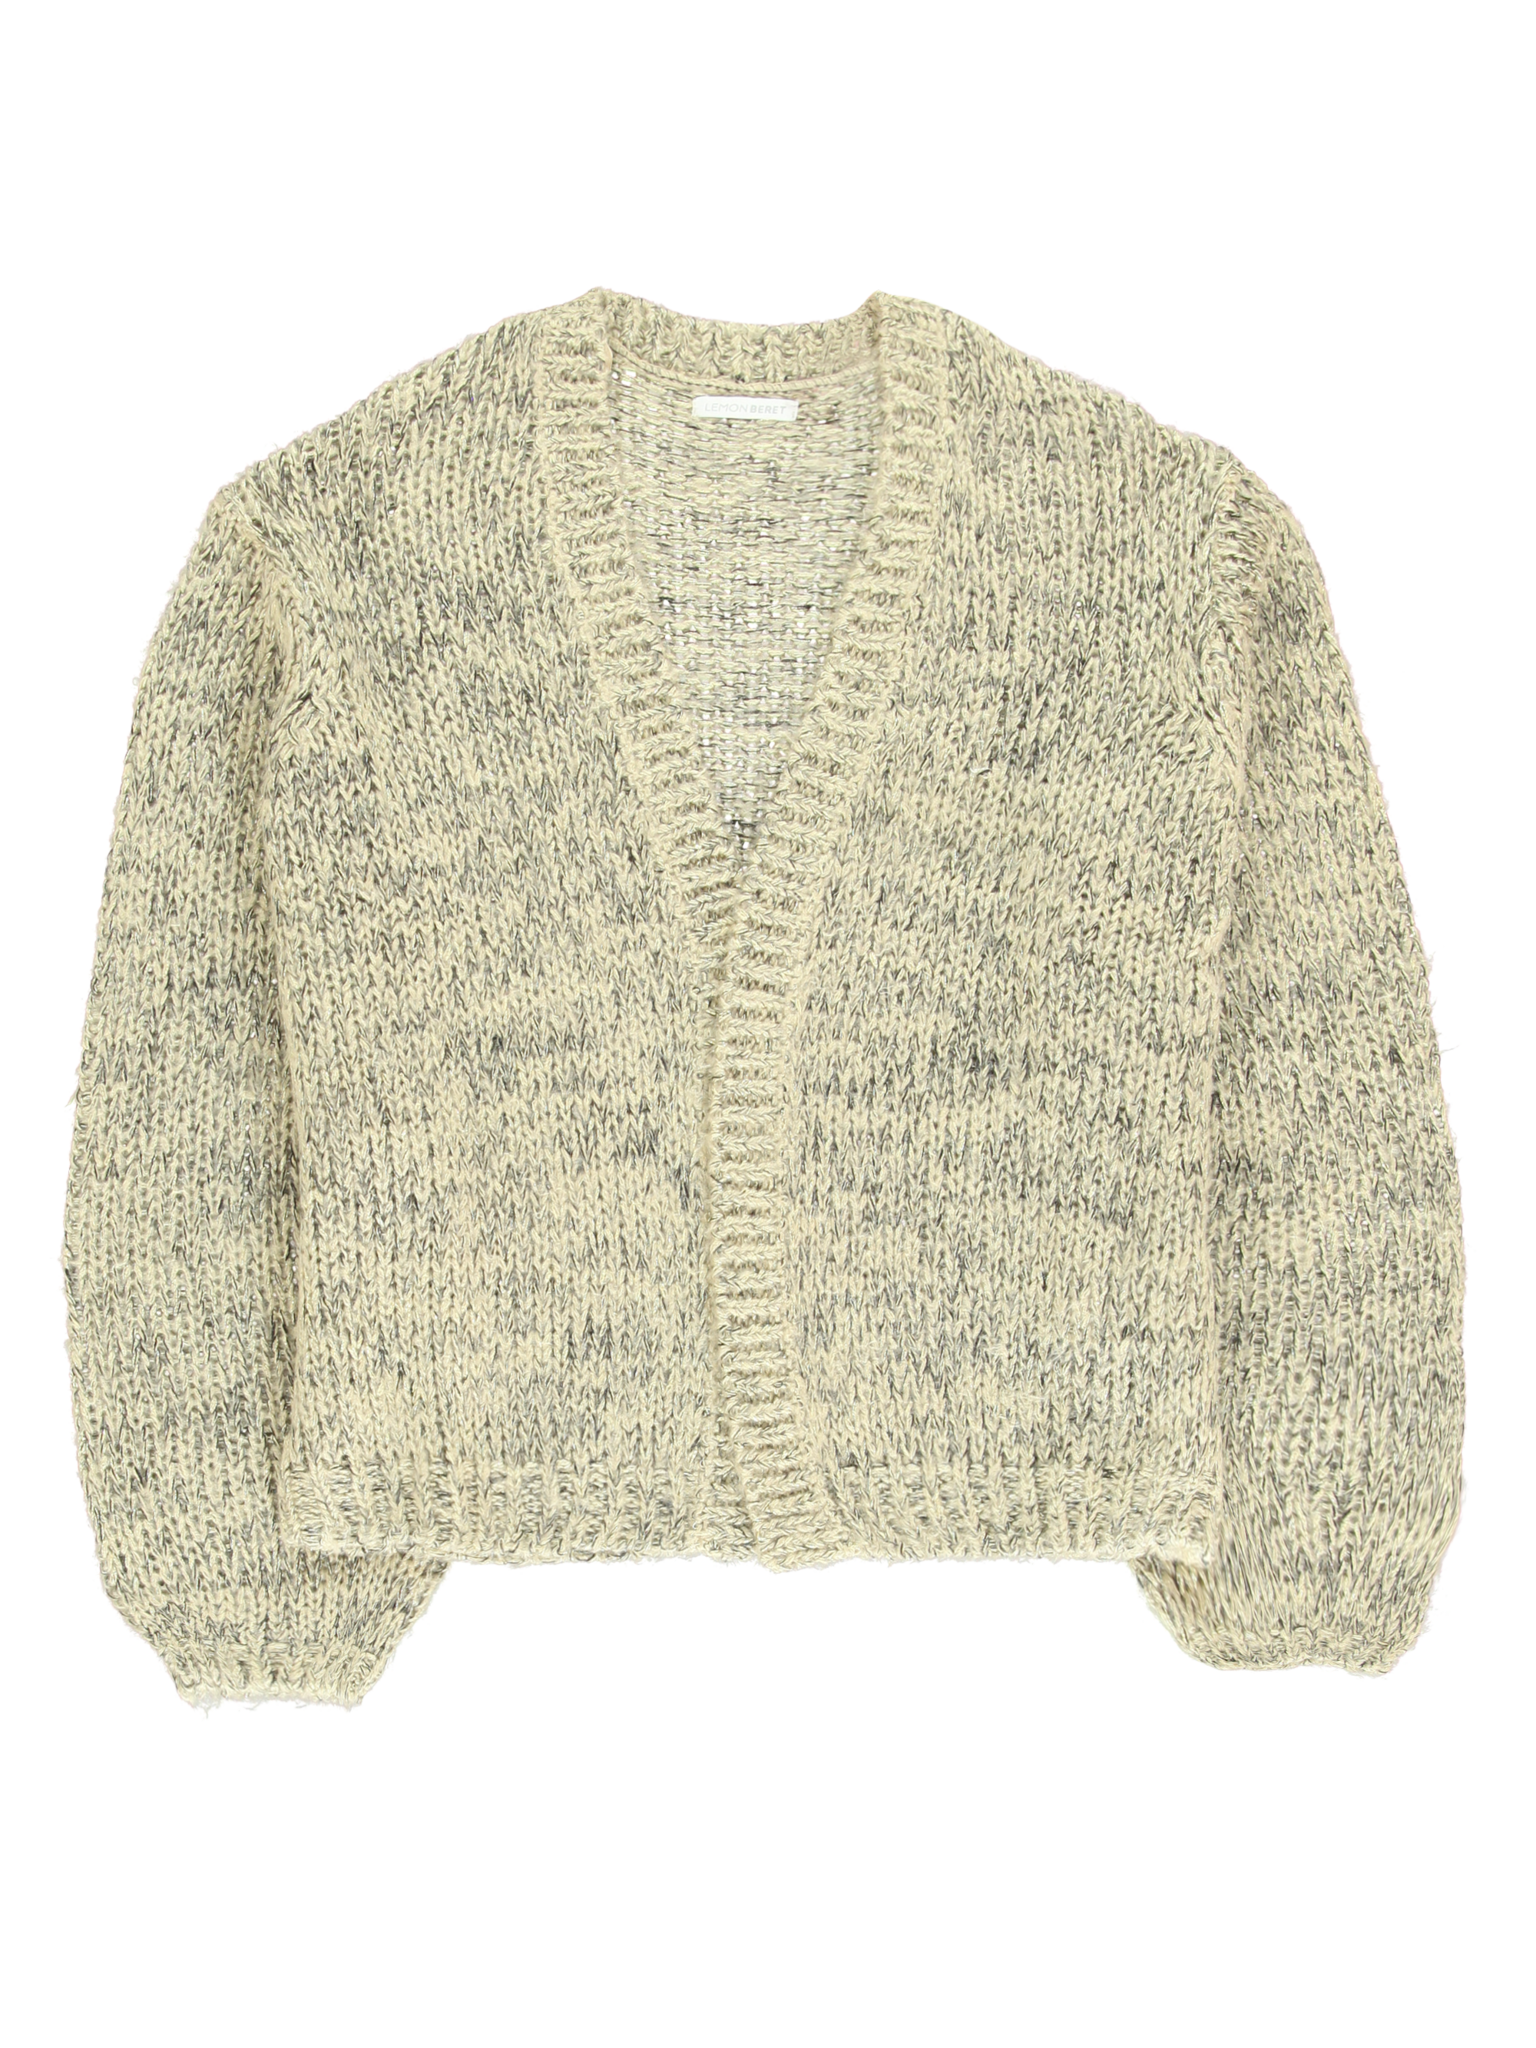 All Brands | Winterproducts Teen Girls | Cardigan Knitwear | 10 pcs/box